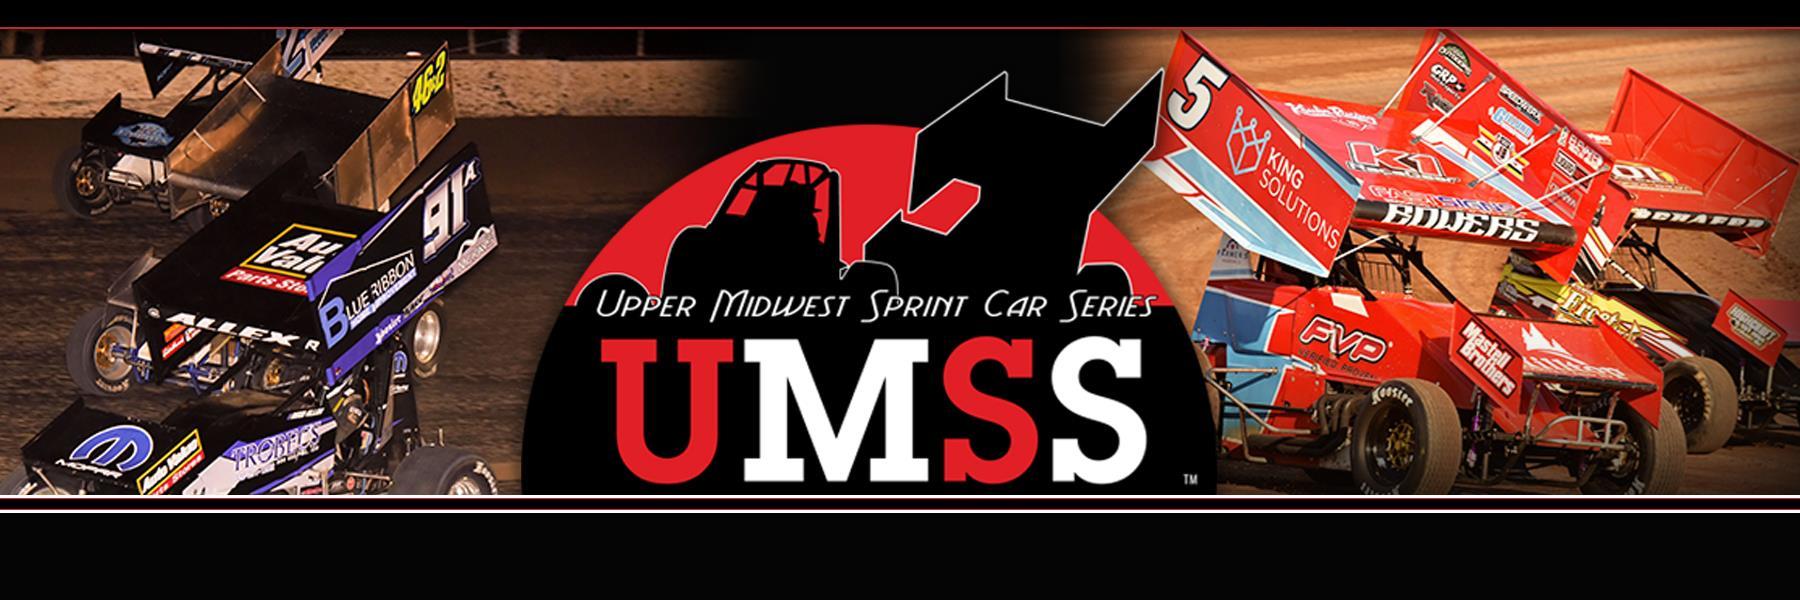 Upper Midwest Sprint Car Series